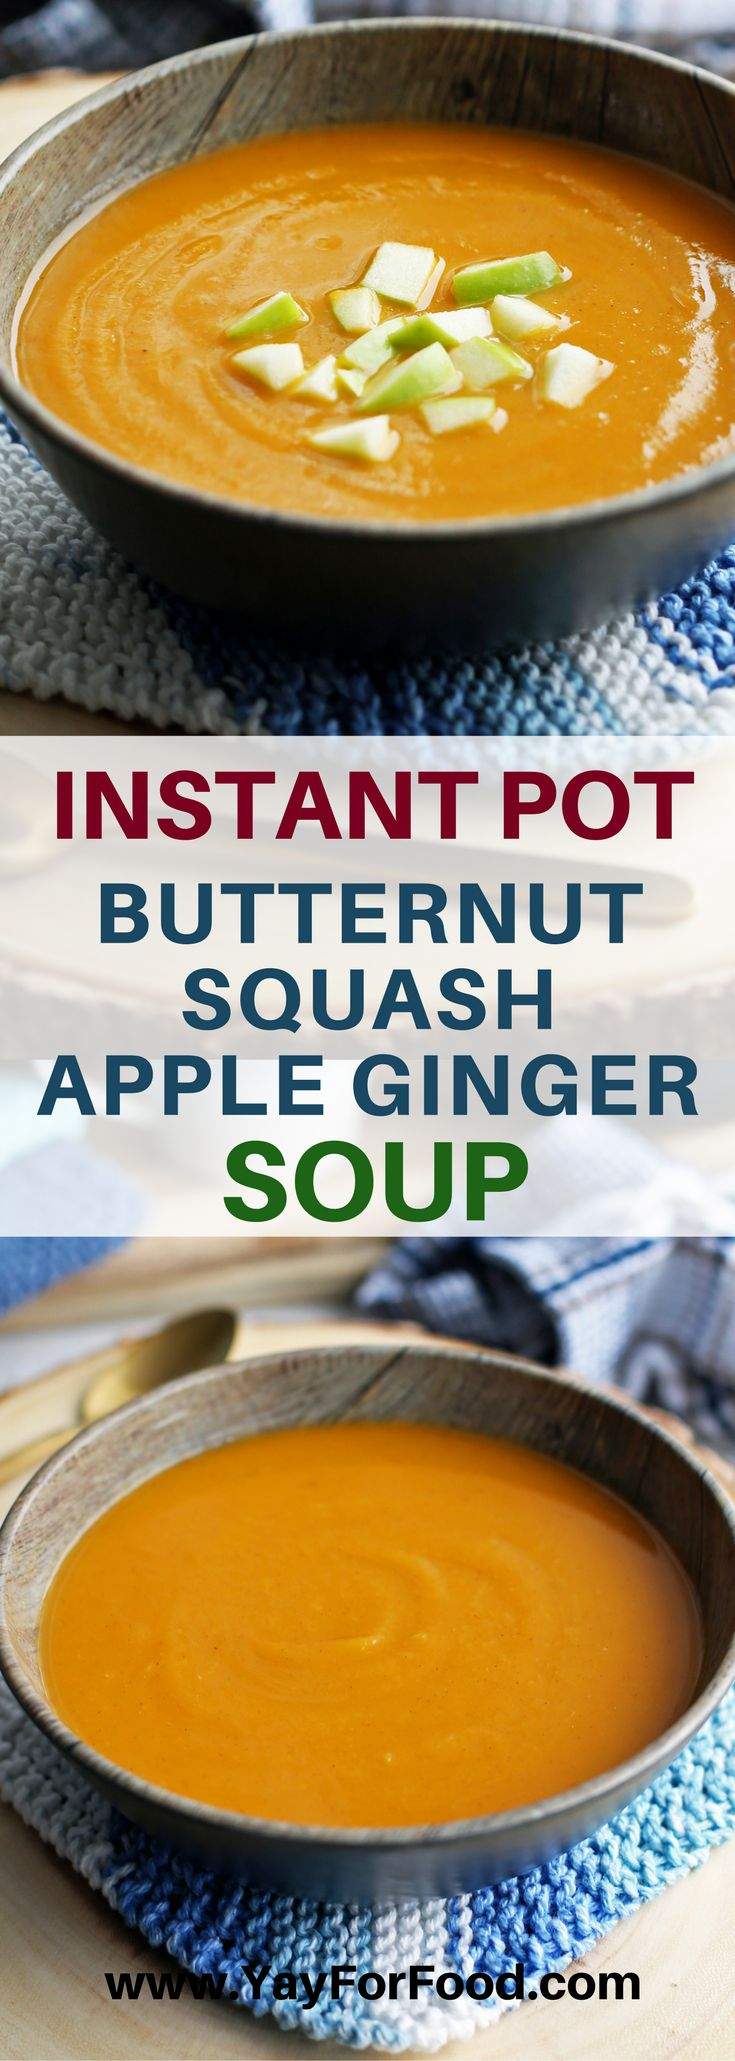 Butternut Squash Apple Ginger Soup